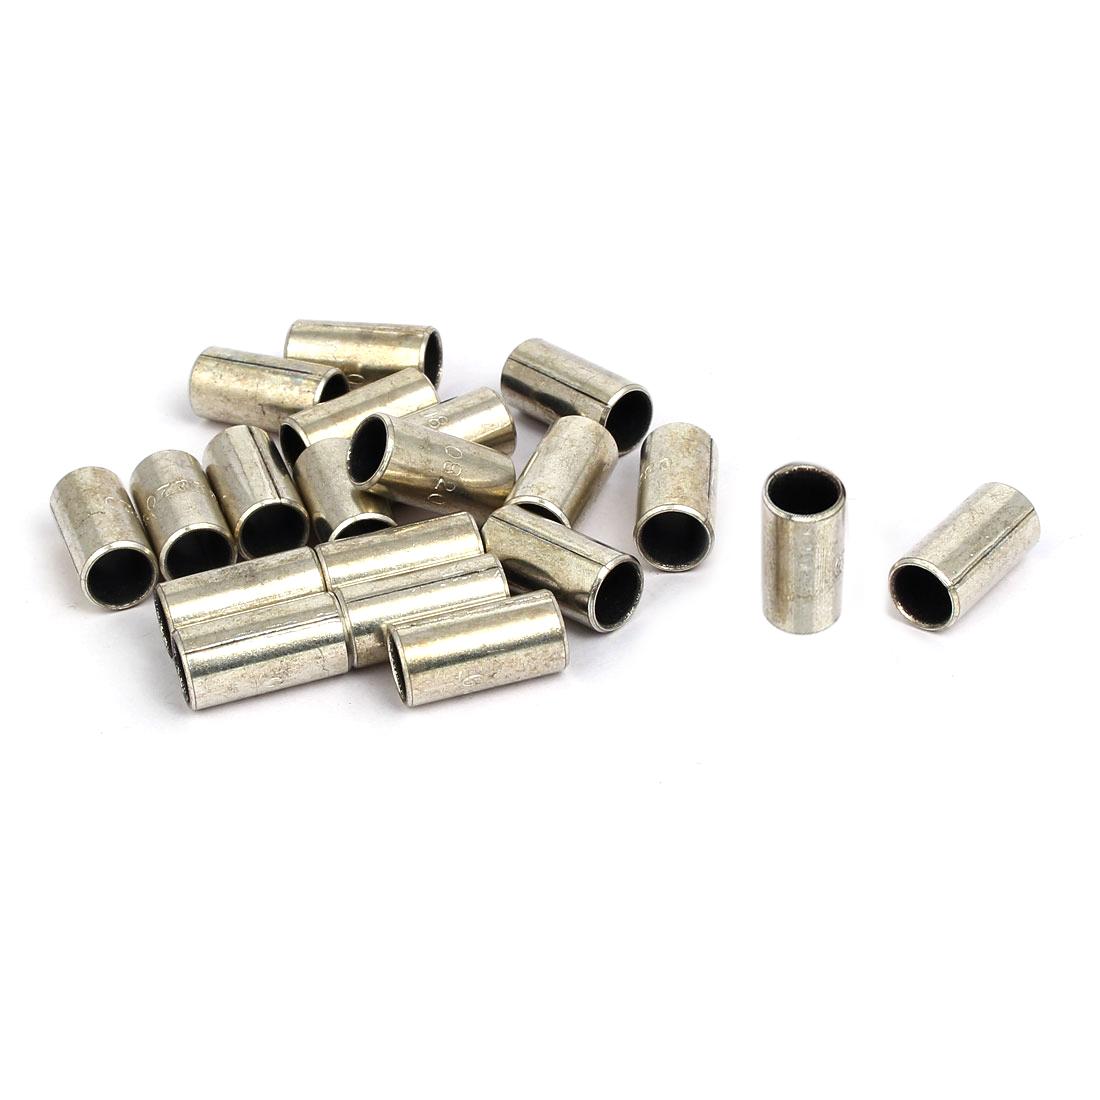 10mmx8mmx20mm Self-lubricating Oilless Bearing Sleeve Composite Bushing 20pcs